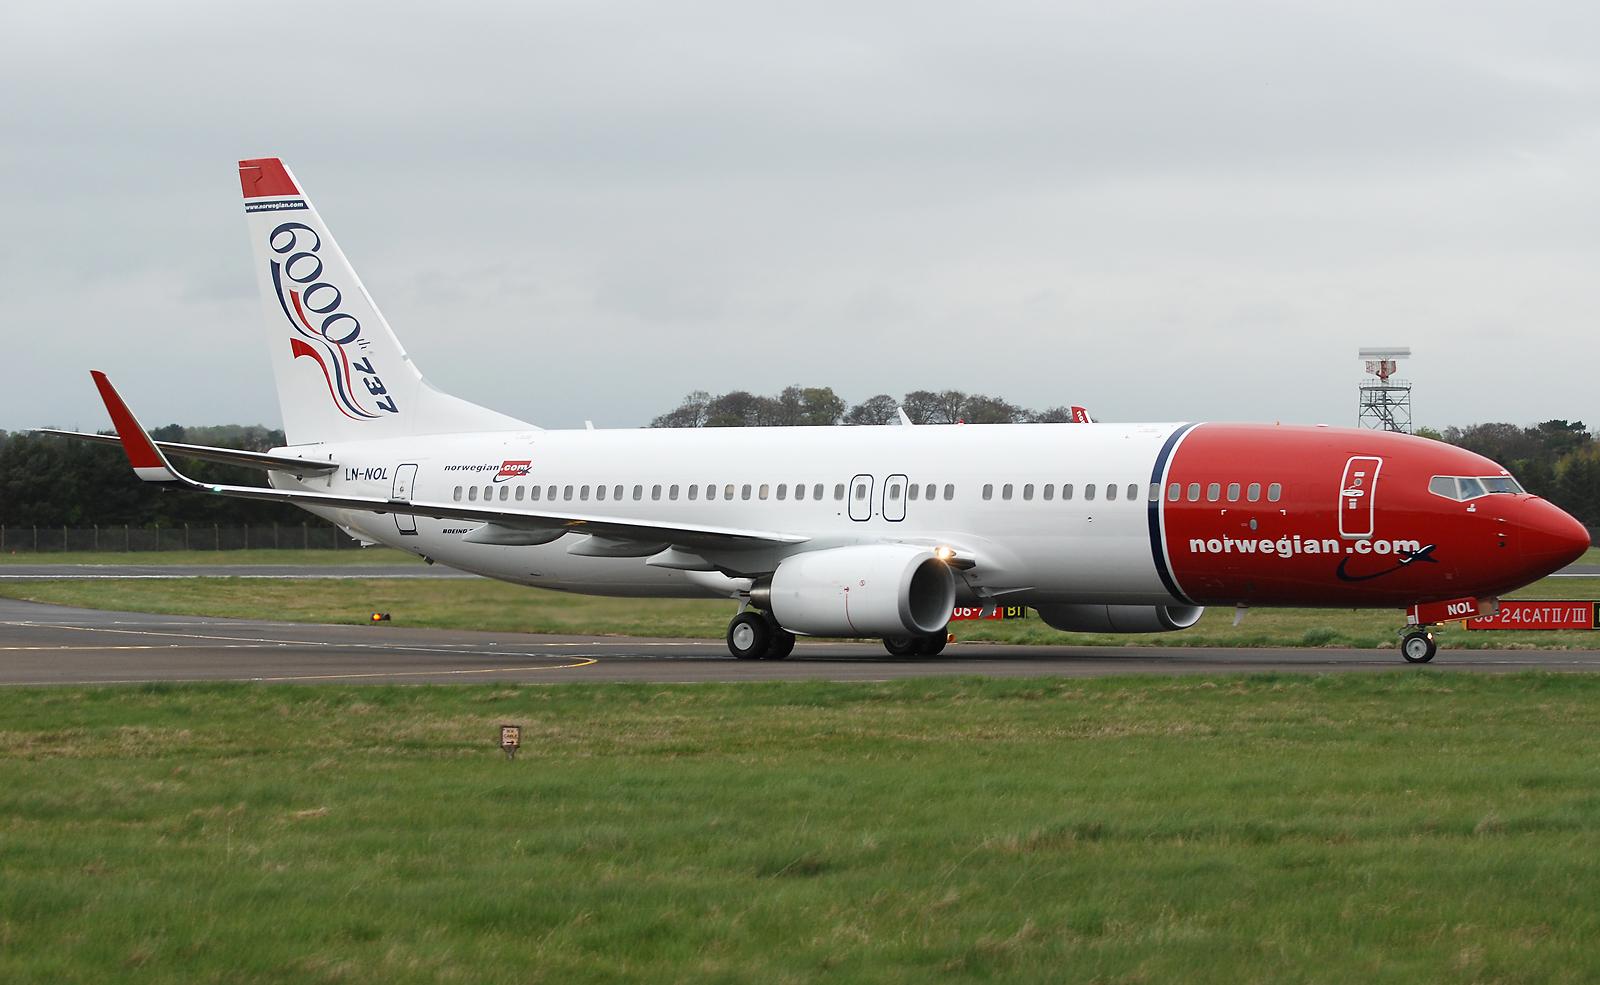 Norwegian Air Shuttle Boeing 737-8Q8. Photo by scott wright / Flickr.